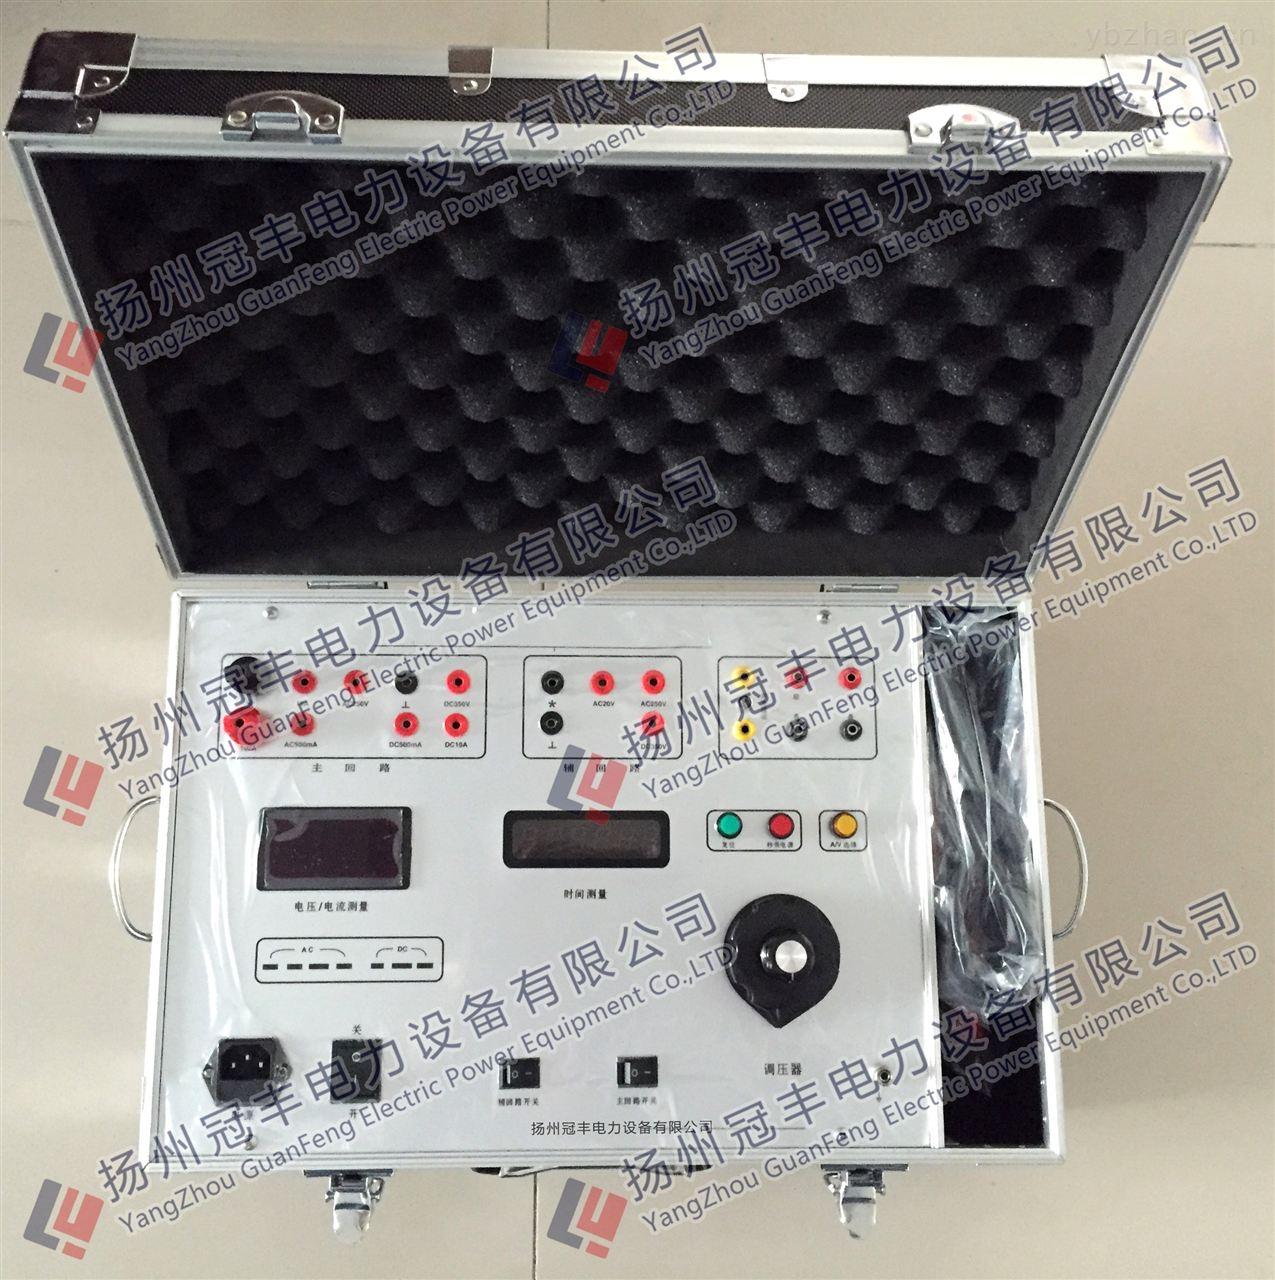 JBC-03型微電腦繼電保護測試儀/單相繼電保護校驗儀/繼保校驗儀報價